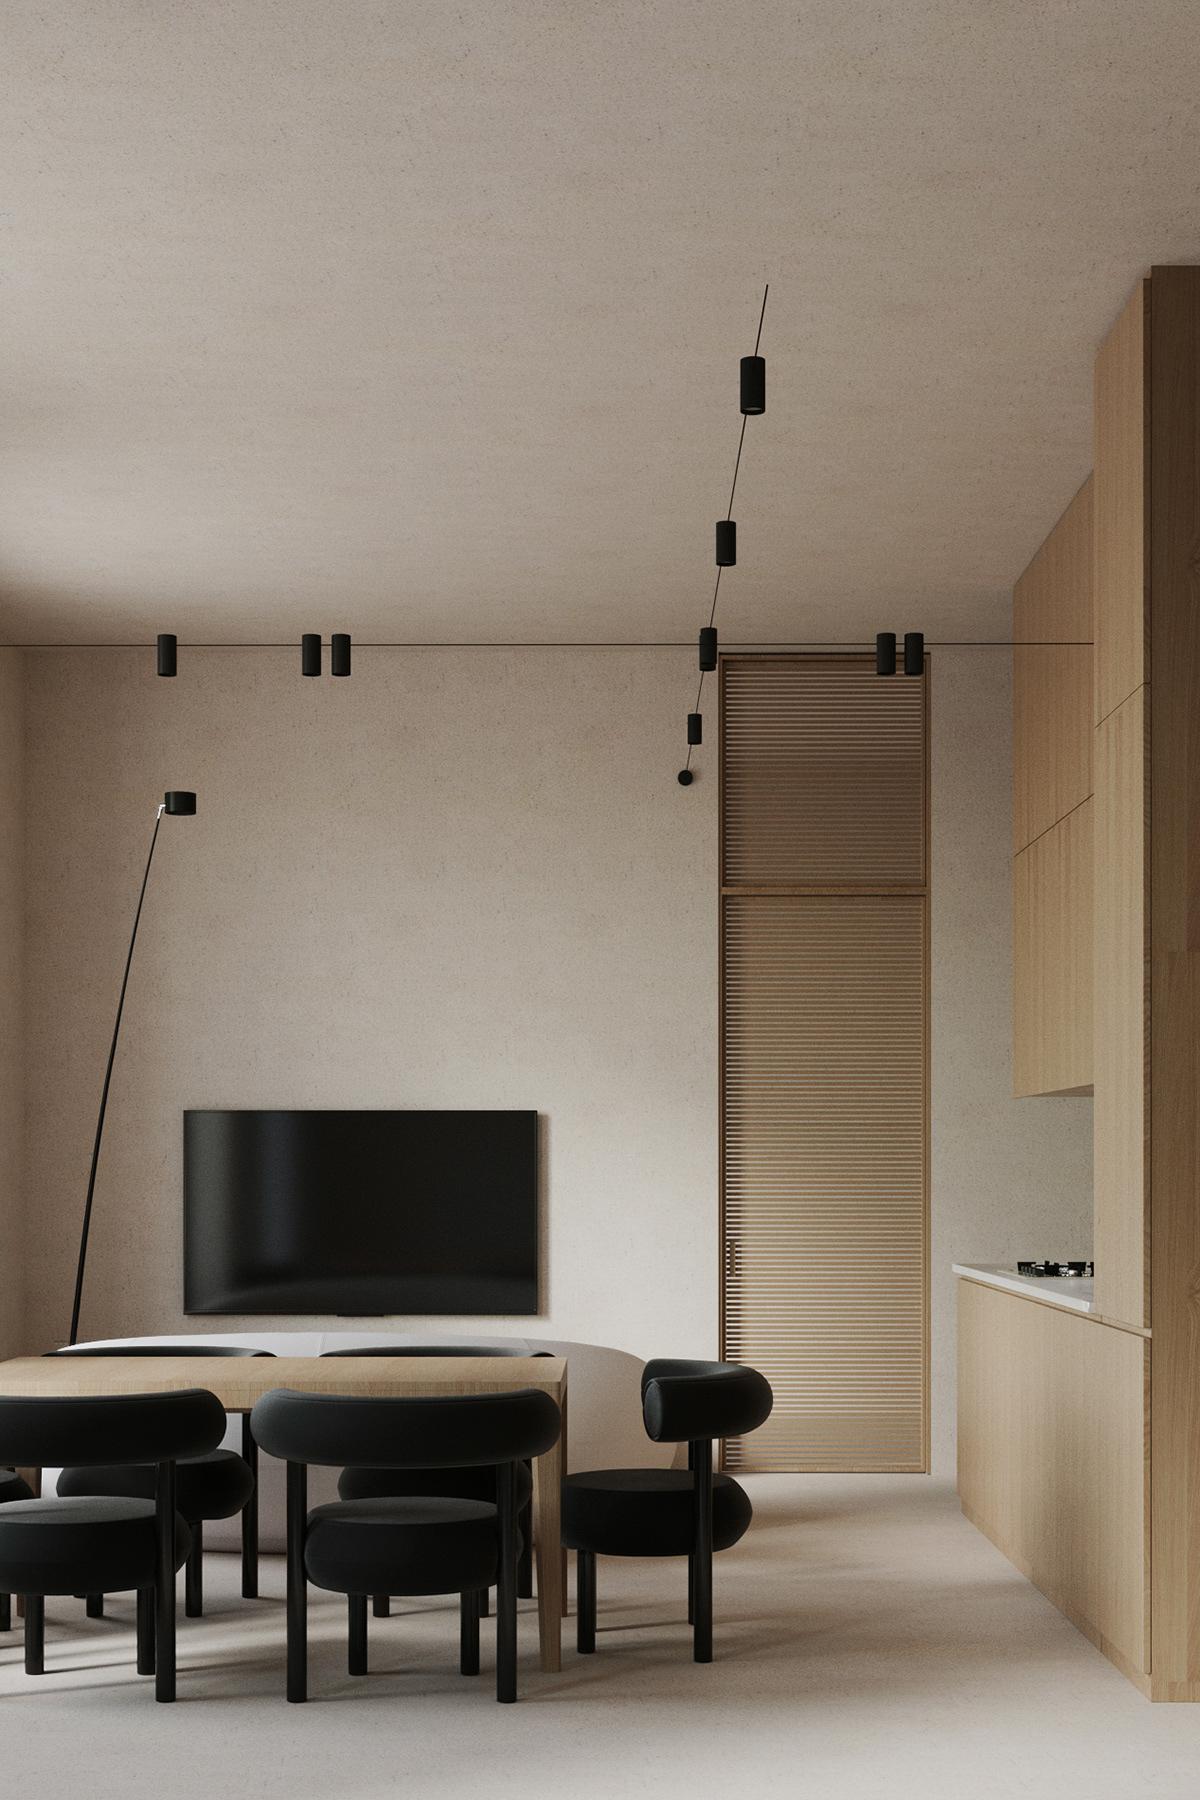 contemporary design davide groppi design interior Minimalism minimalistic design modern interior tom dixon kitchen design Natural Interior Vizualization